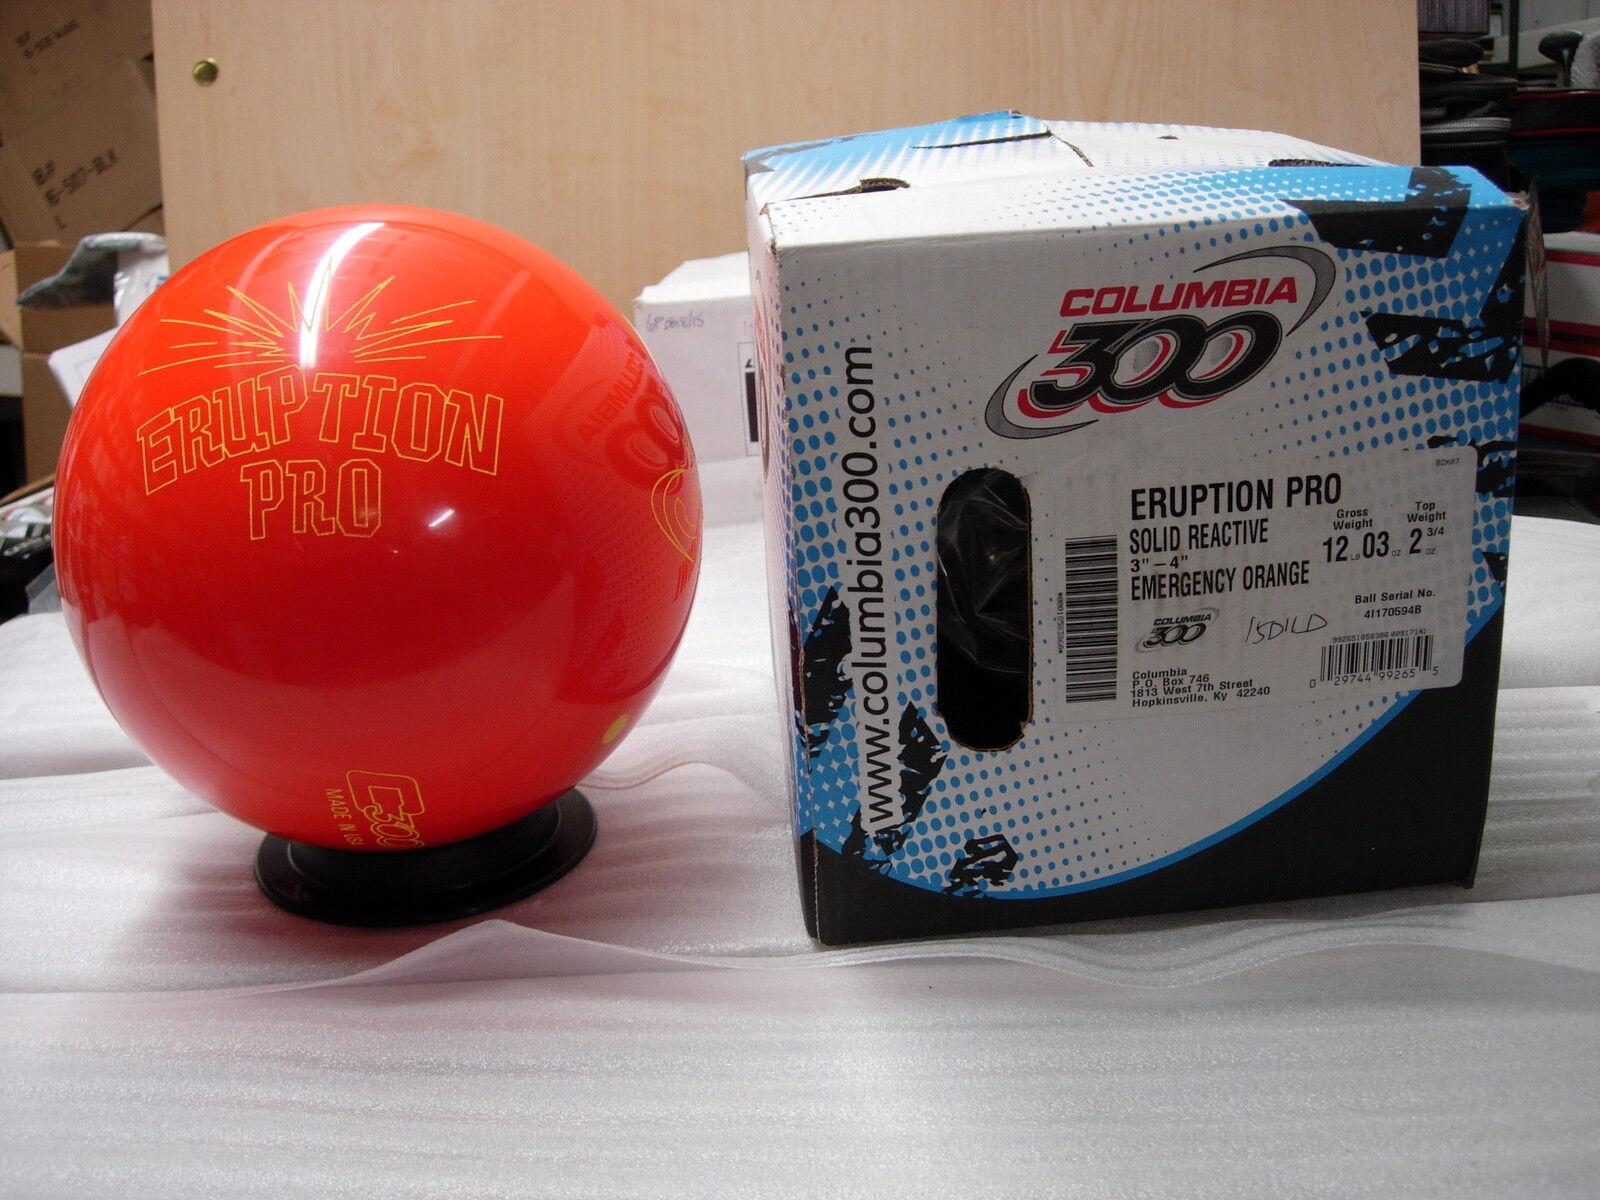 12oz, TW 2-3 4, Pin 3-4, NIB Columbia 2014 ERUPTION PRO Bowling Ball